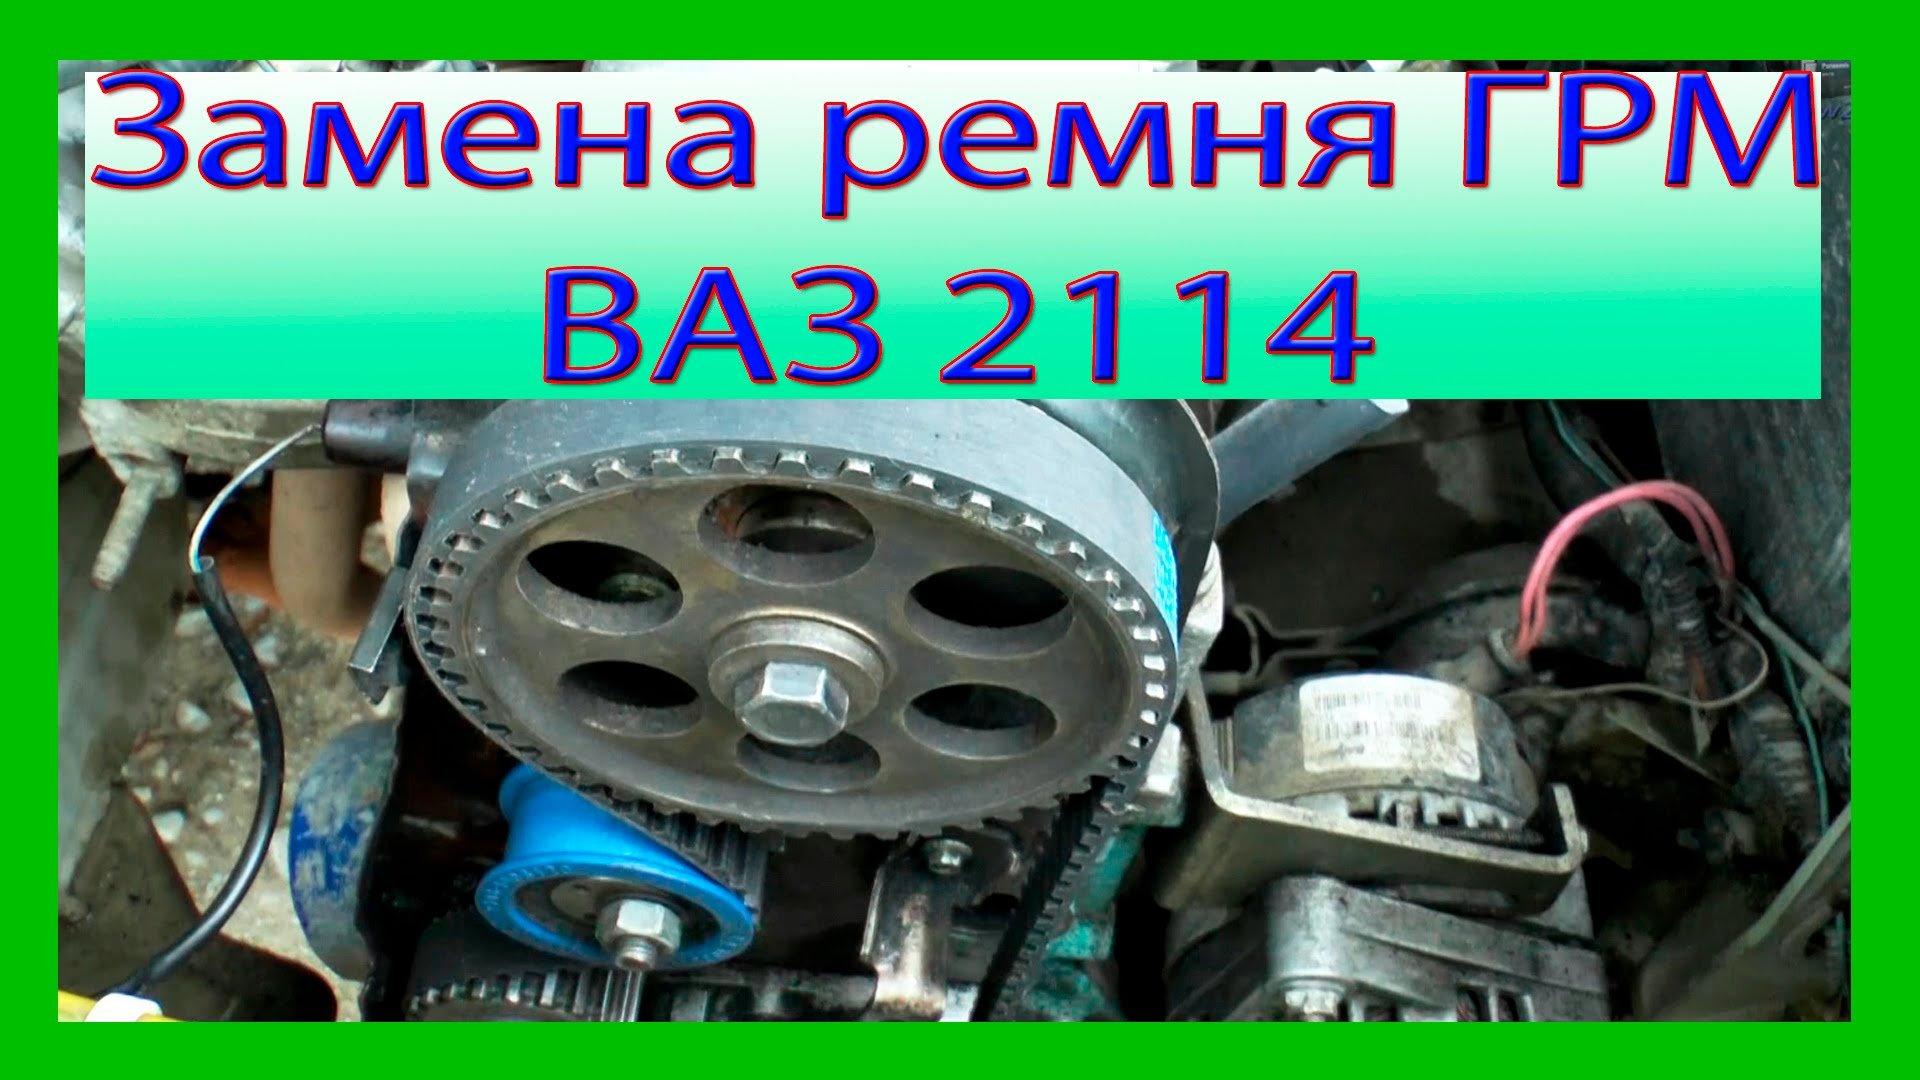 Замена Ремня Грм Ваз 2115 Инжектор